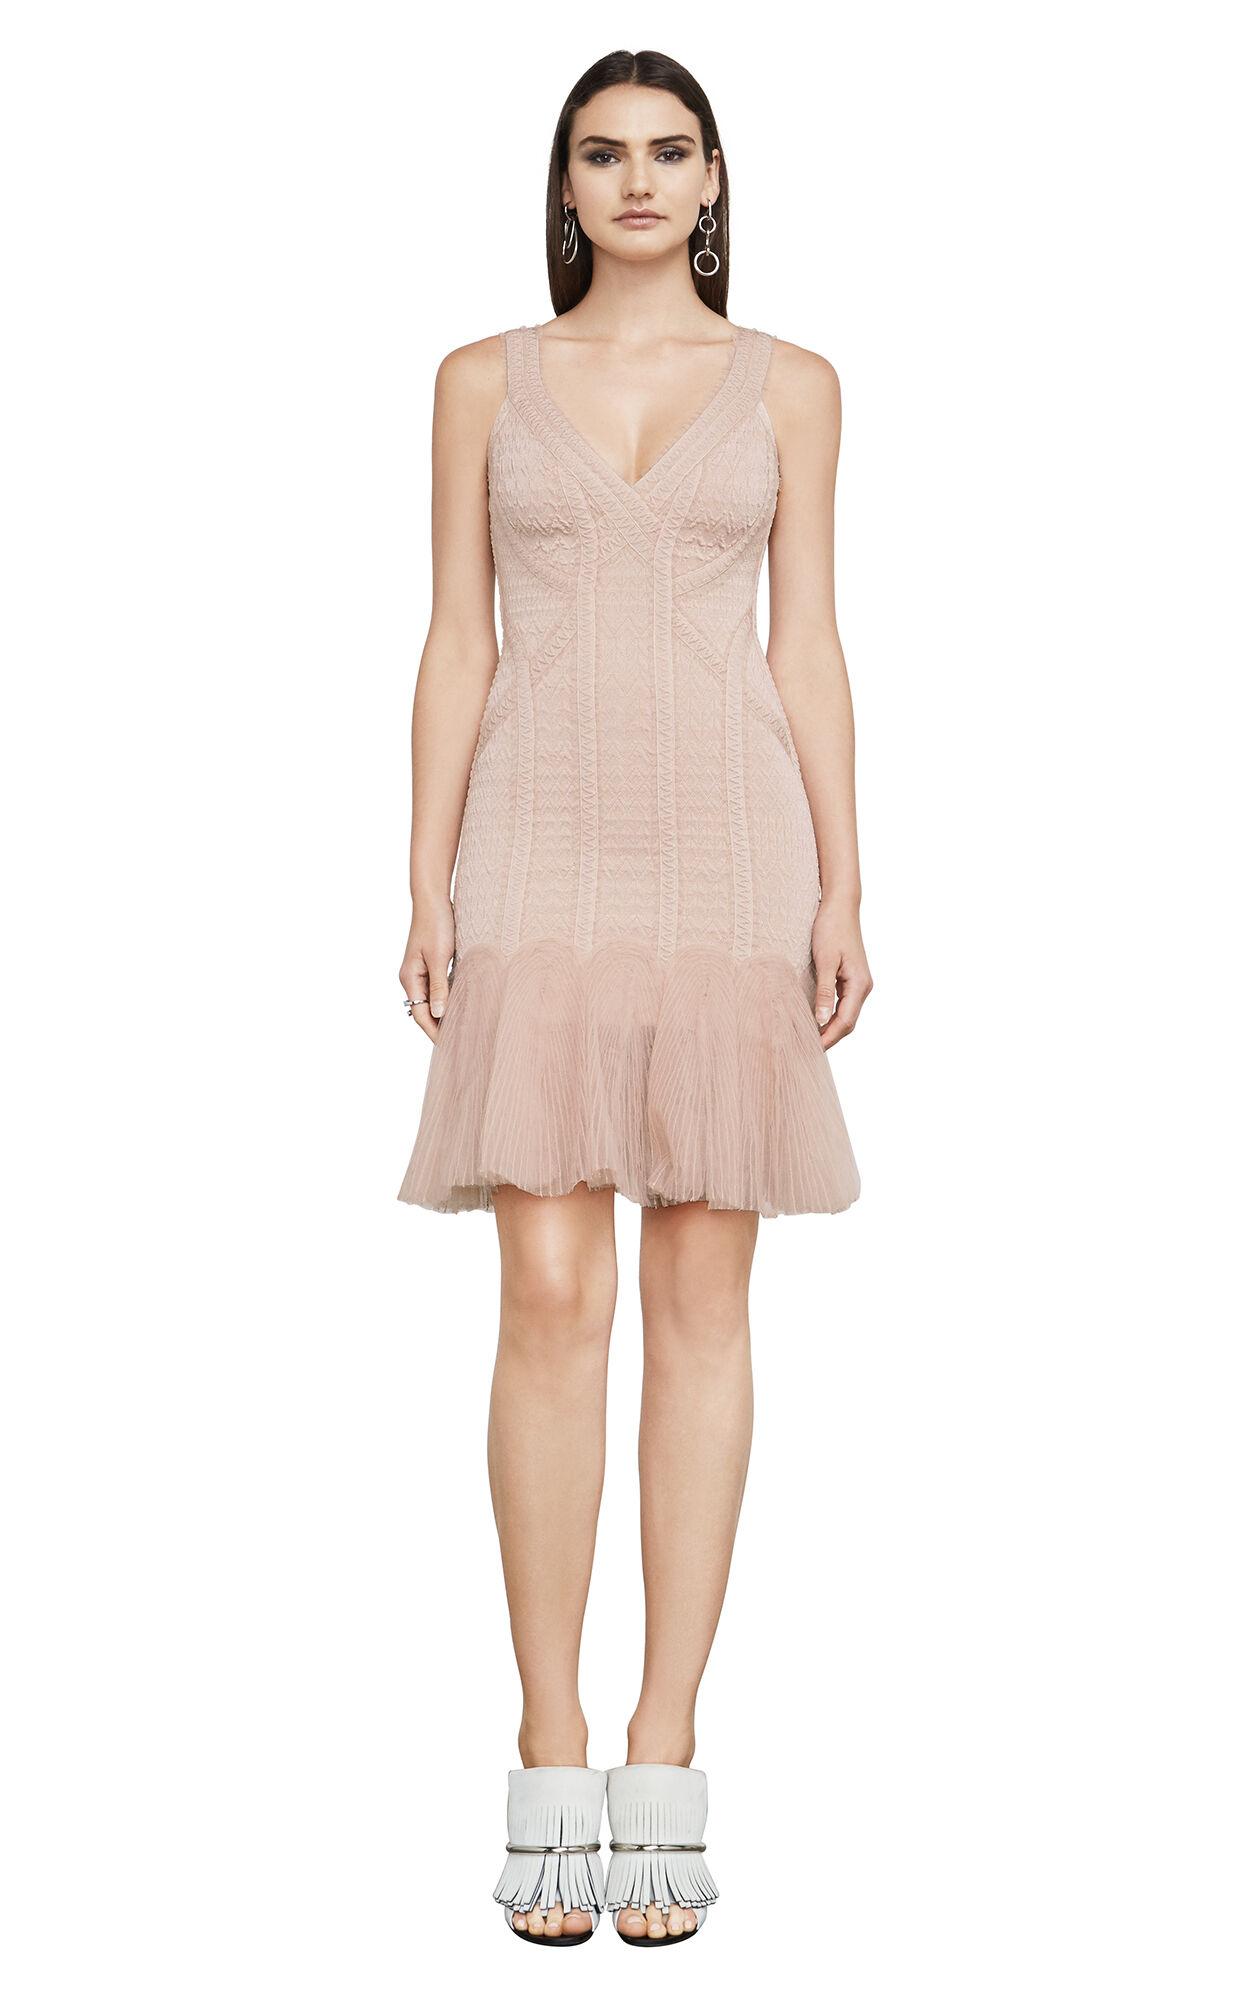 Natia Zigzag Tulle Off-Shoulder Body-Con Dress